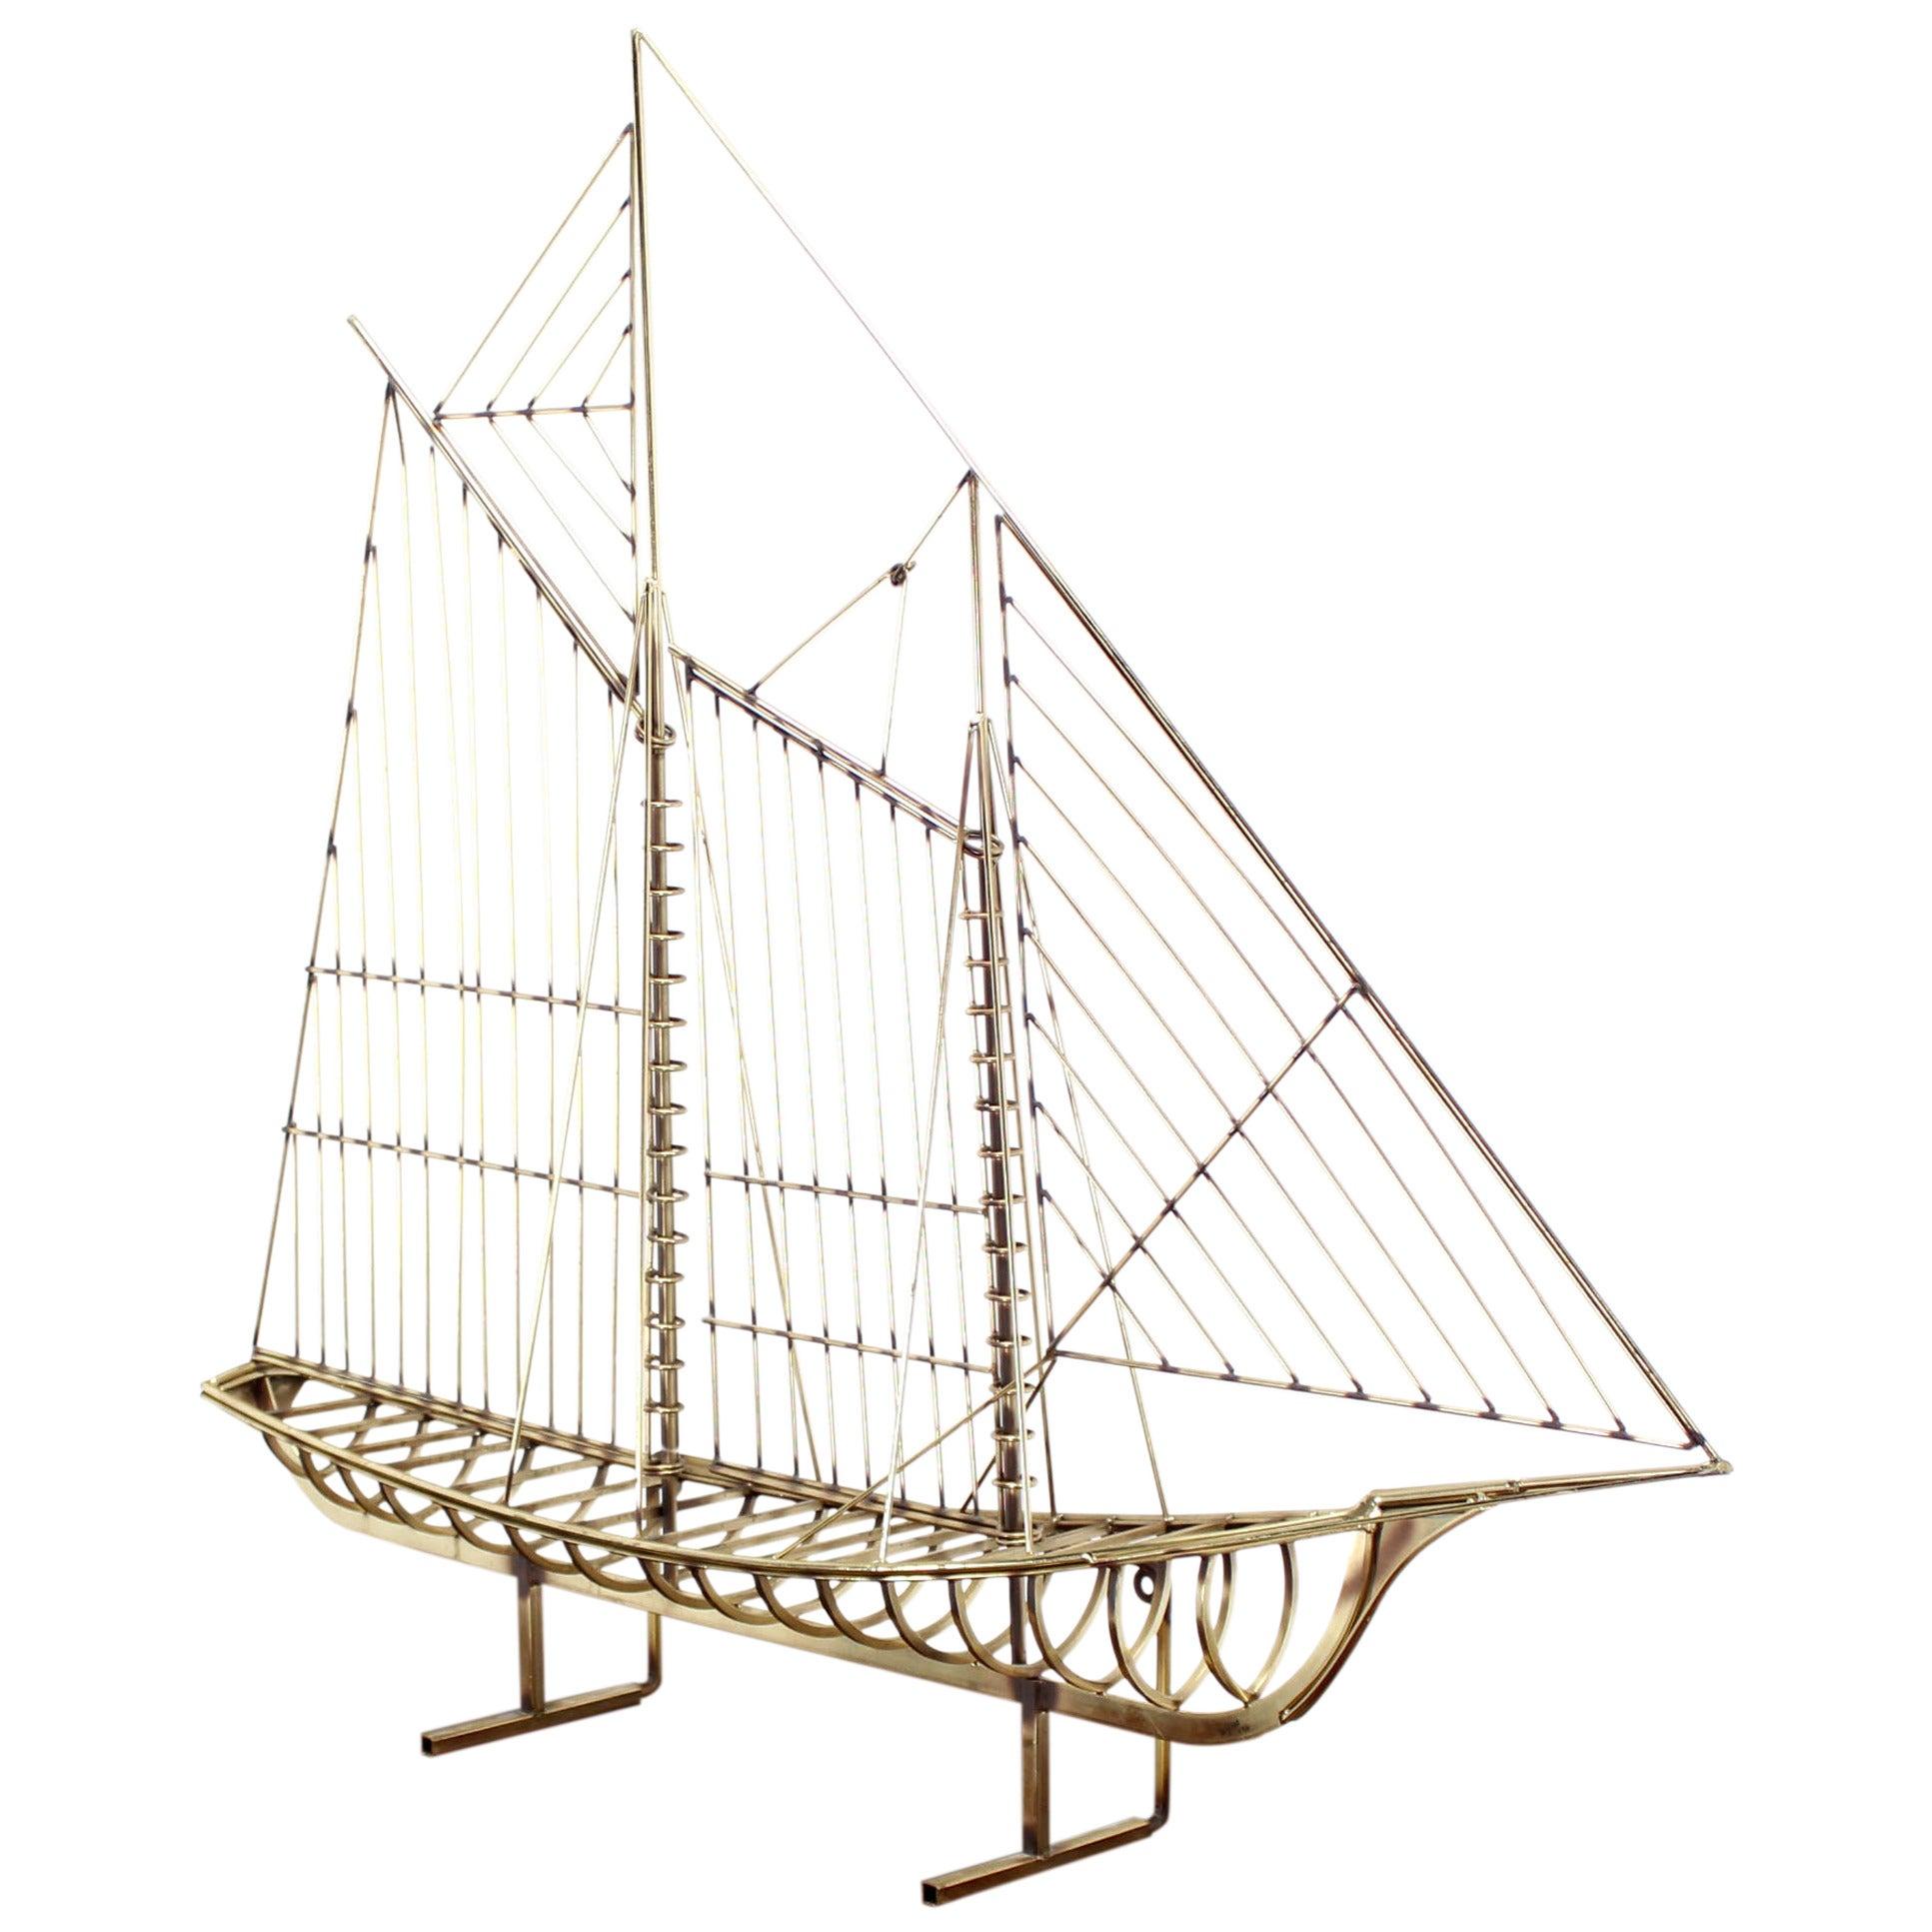 Long Brass 1976 Curtis Jere Sail Boat Sculpture